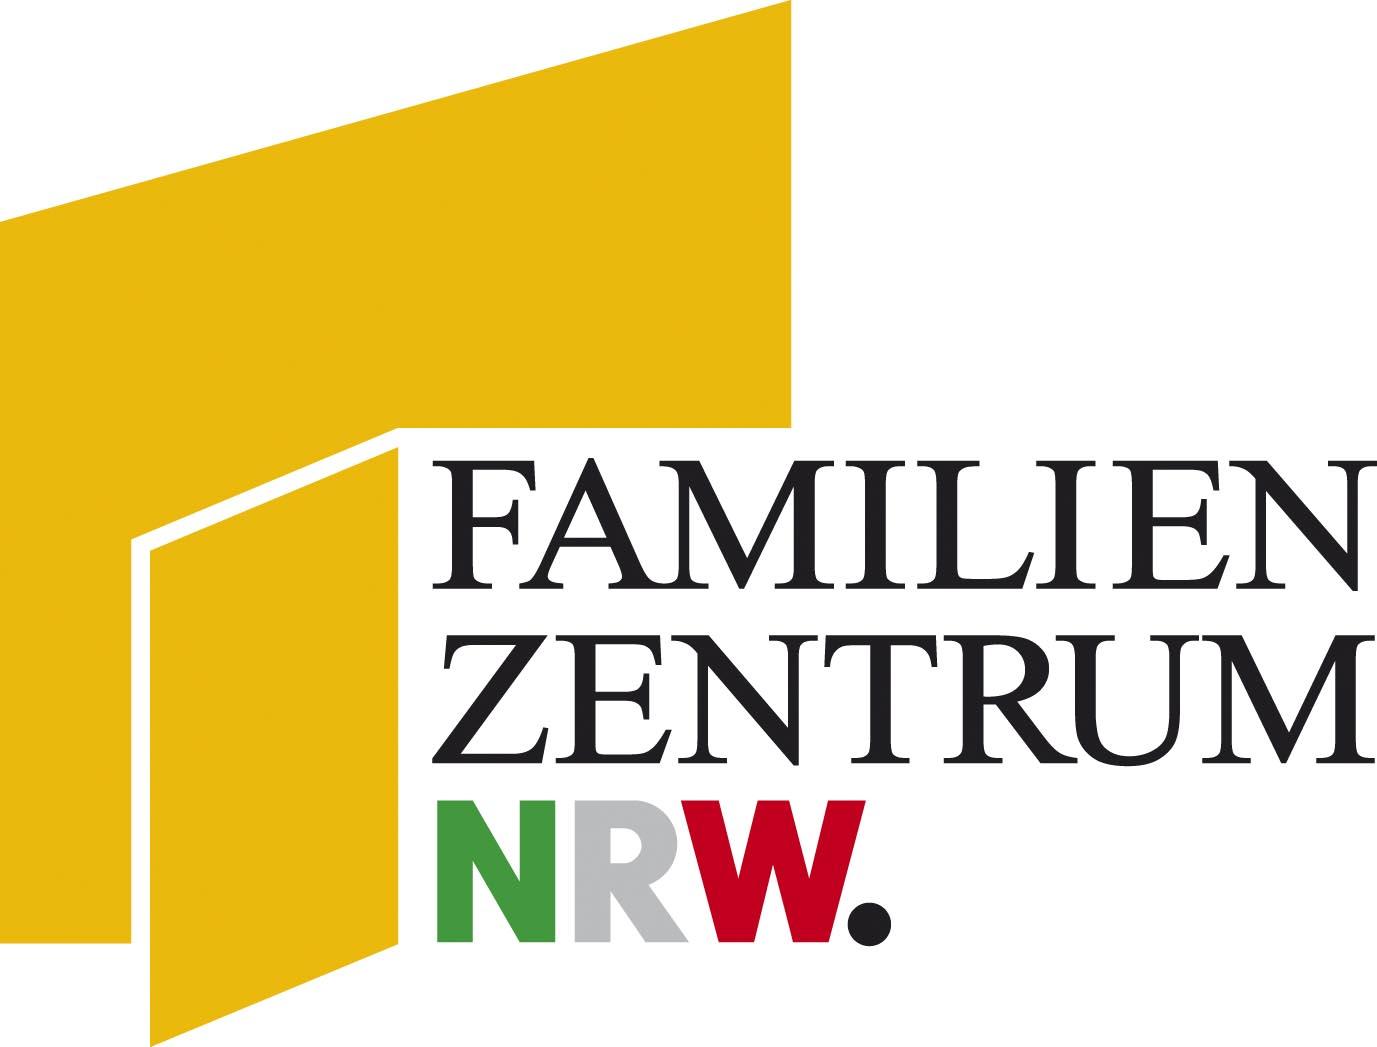 Familienzentren.NRW.de